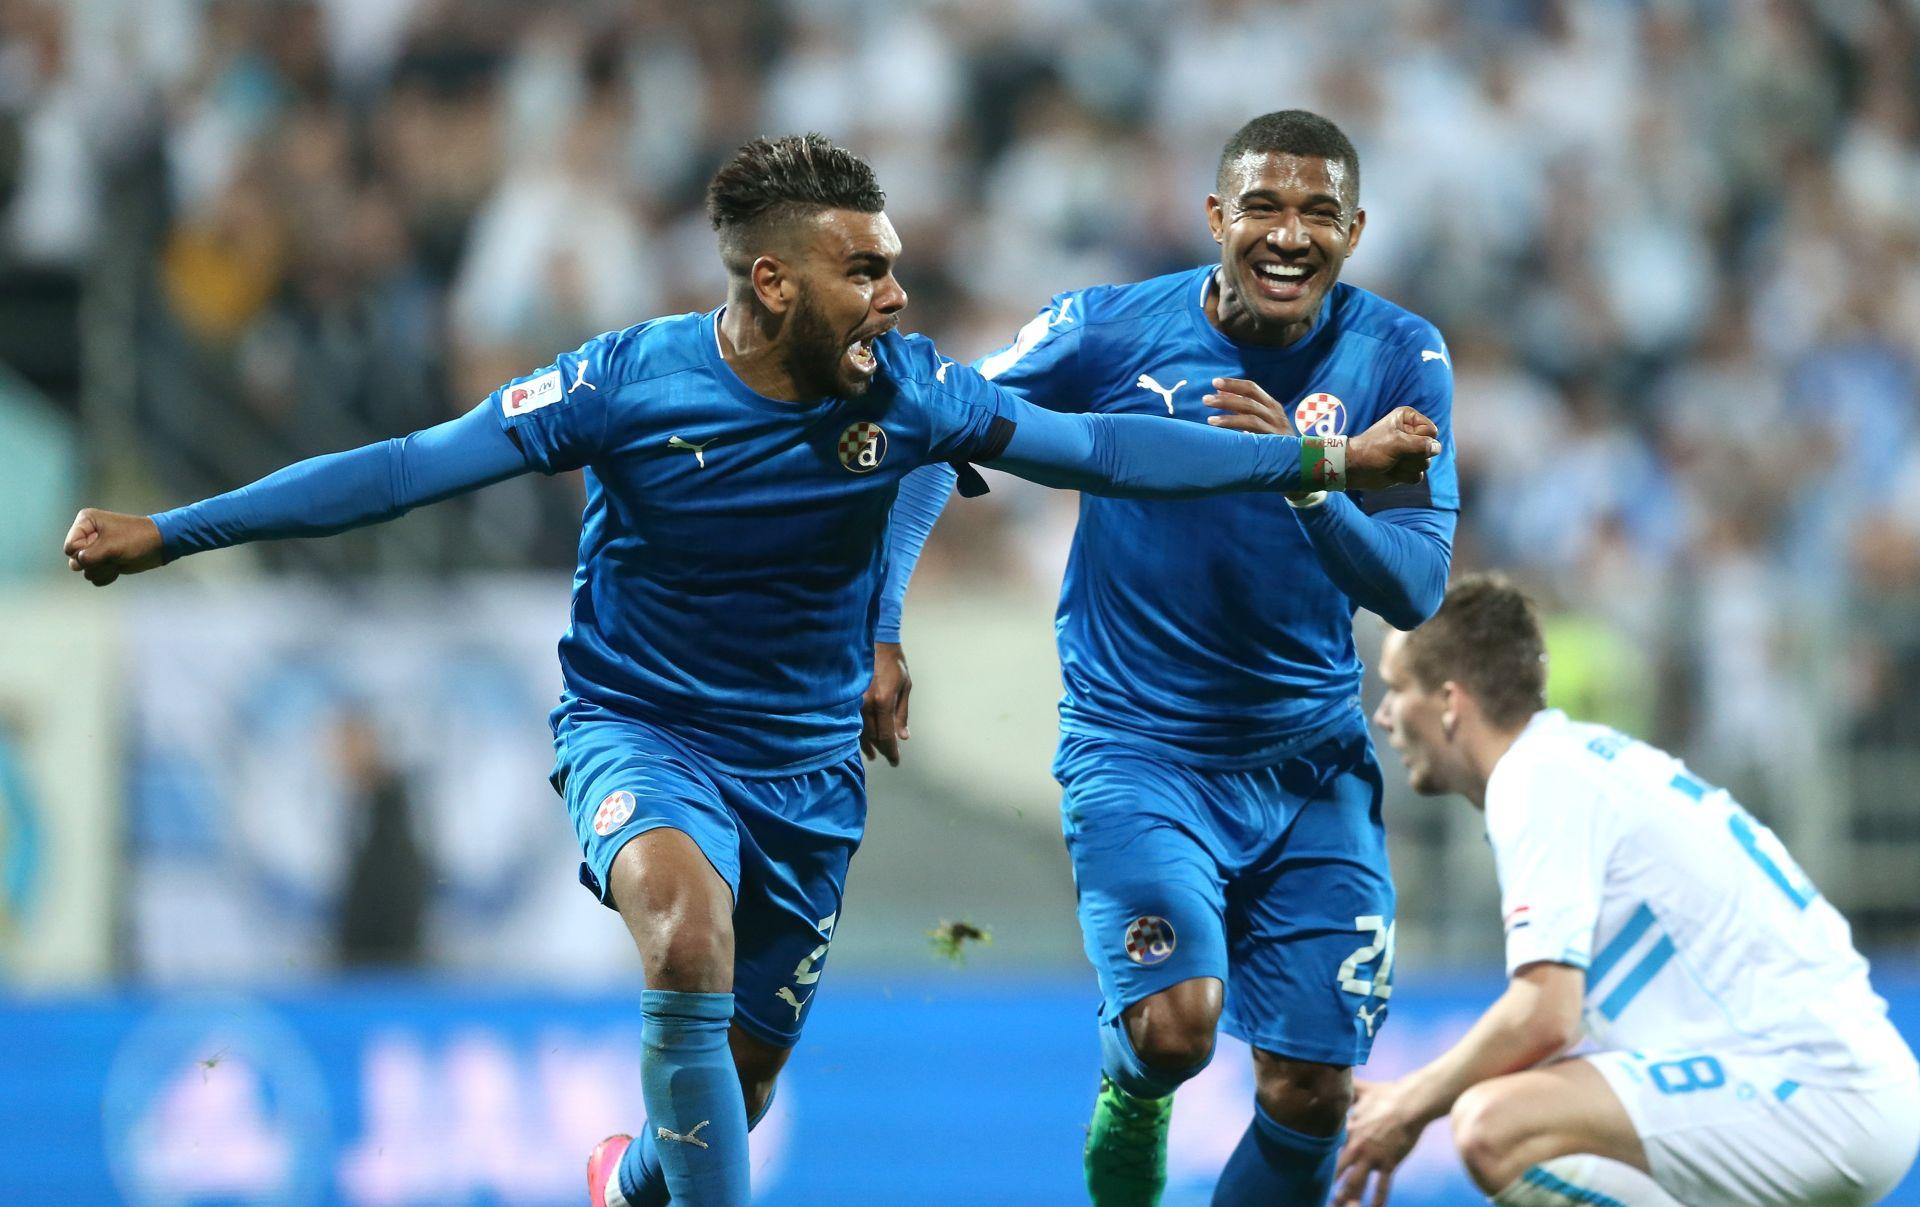 UŽIVO: KLJUČNI DERBI NA MAKSIMIRU Dinamo preokrenuo, Soudani zabio dva gola